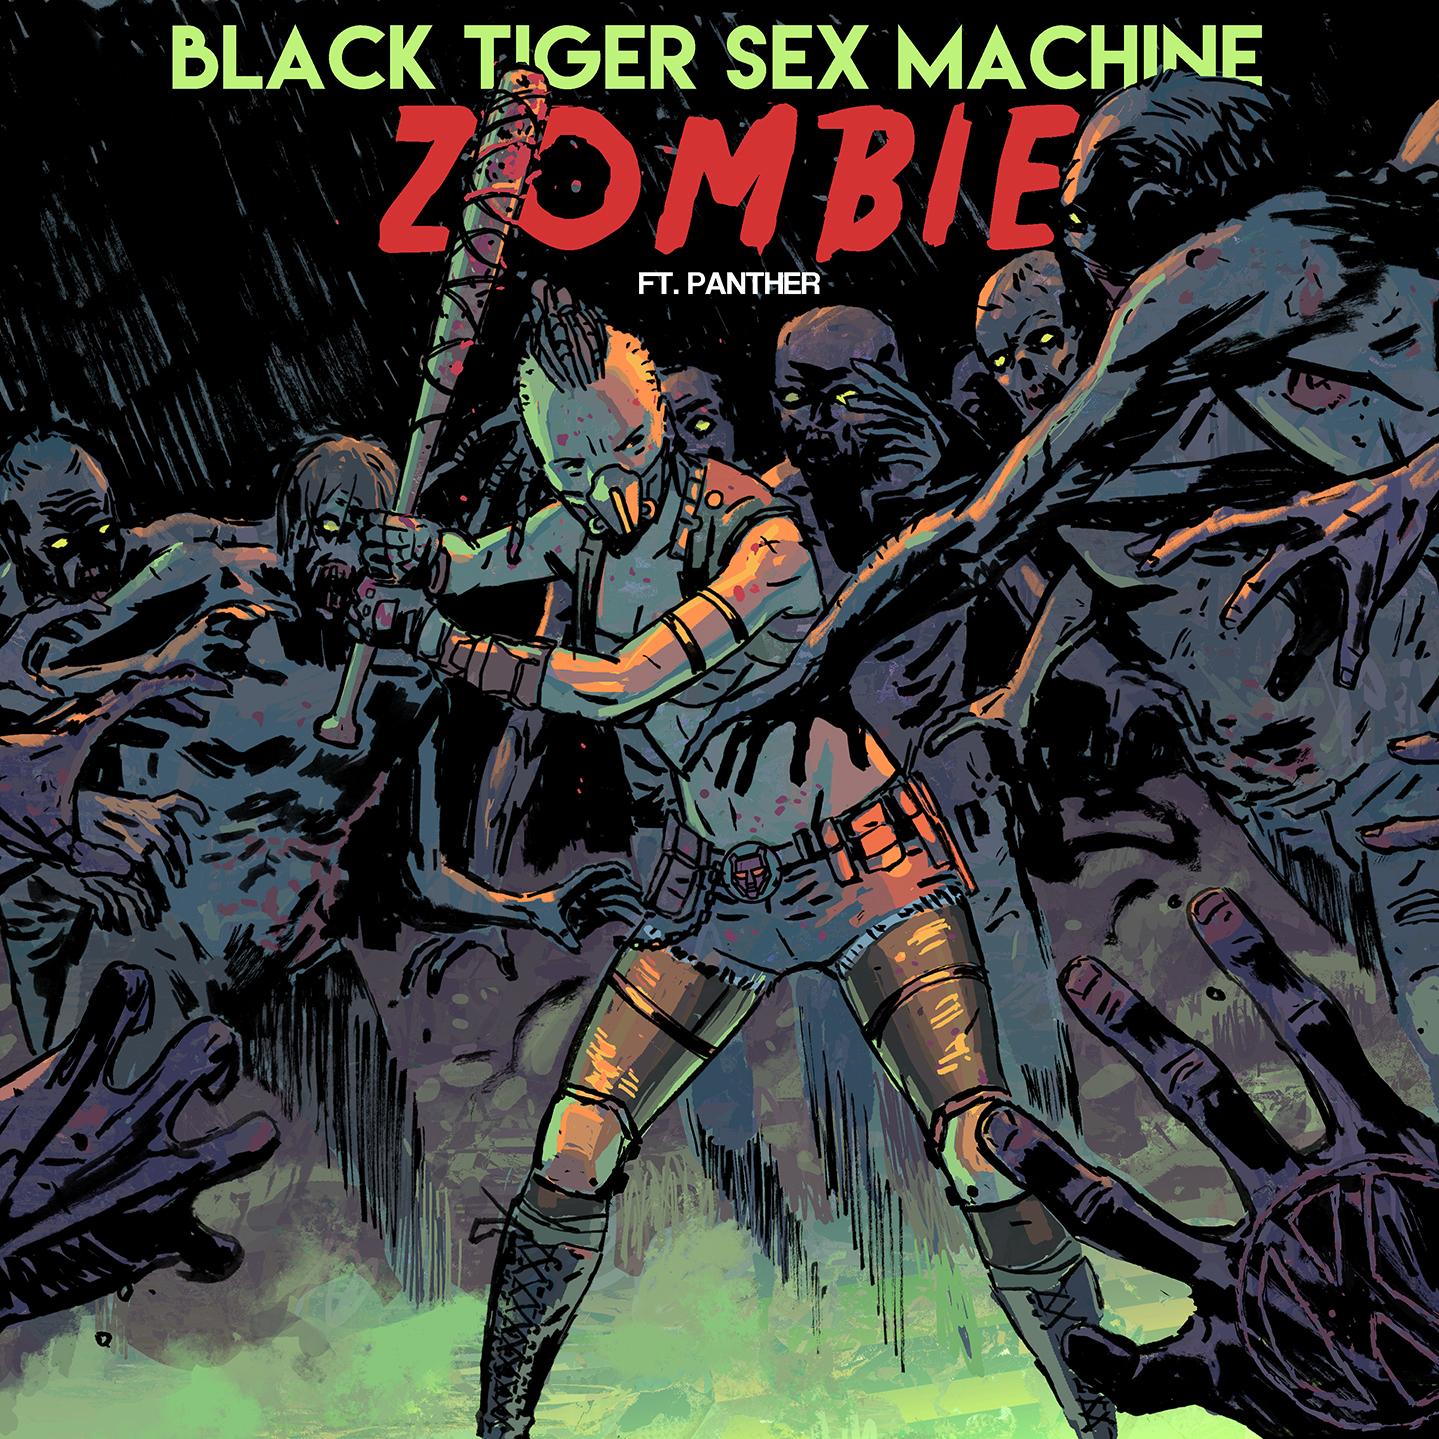 Black Tiger Sex Machine